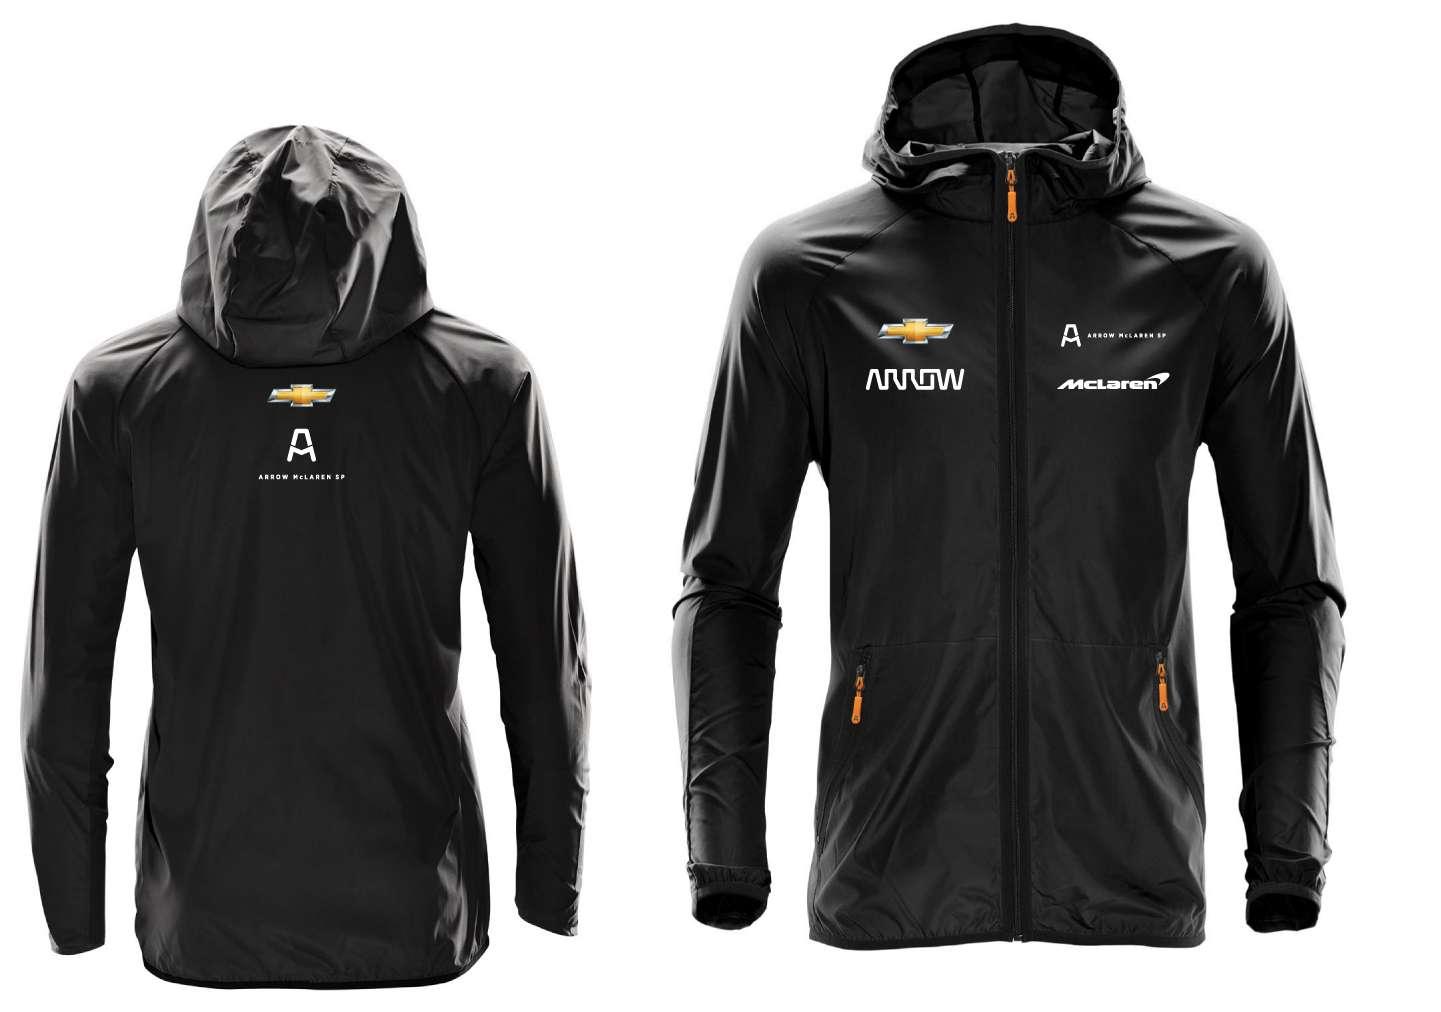 2XL Men's Official Team Rain Jacket